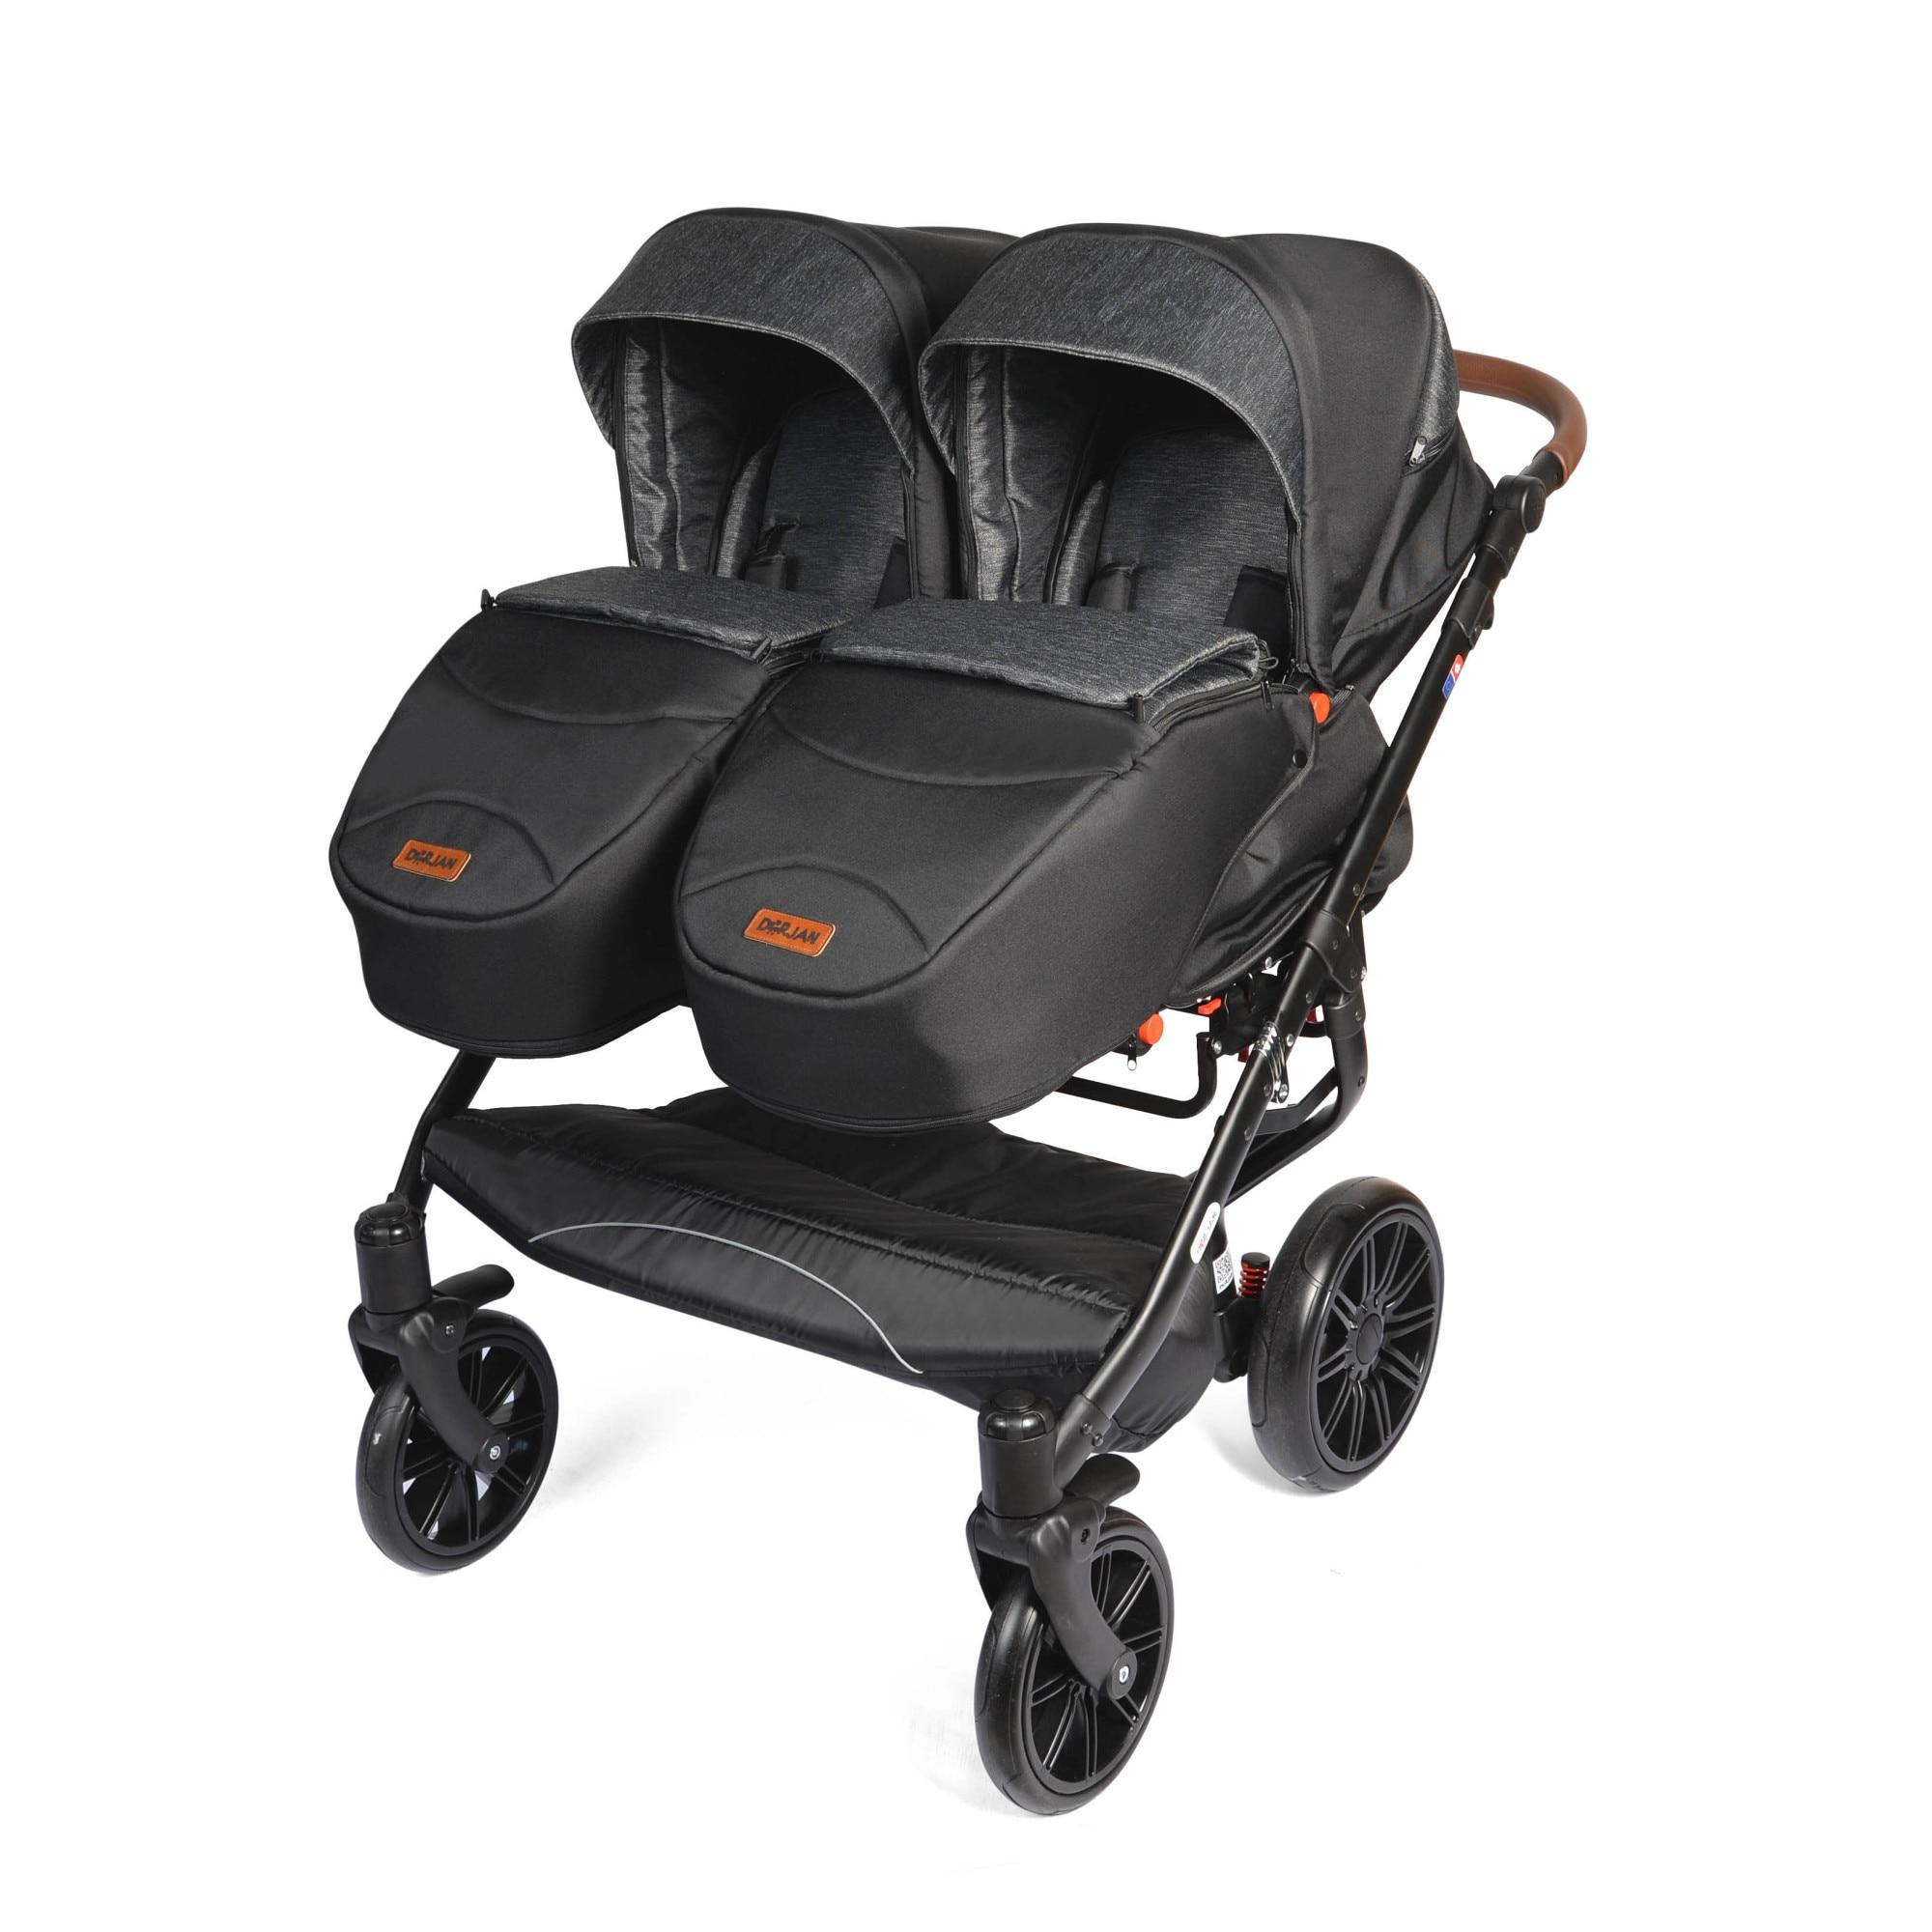 Детска количка Dorjan Quick Twin15 2в1 - eMAG.bg